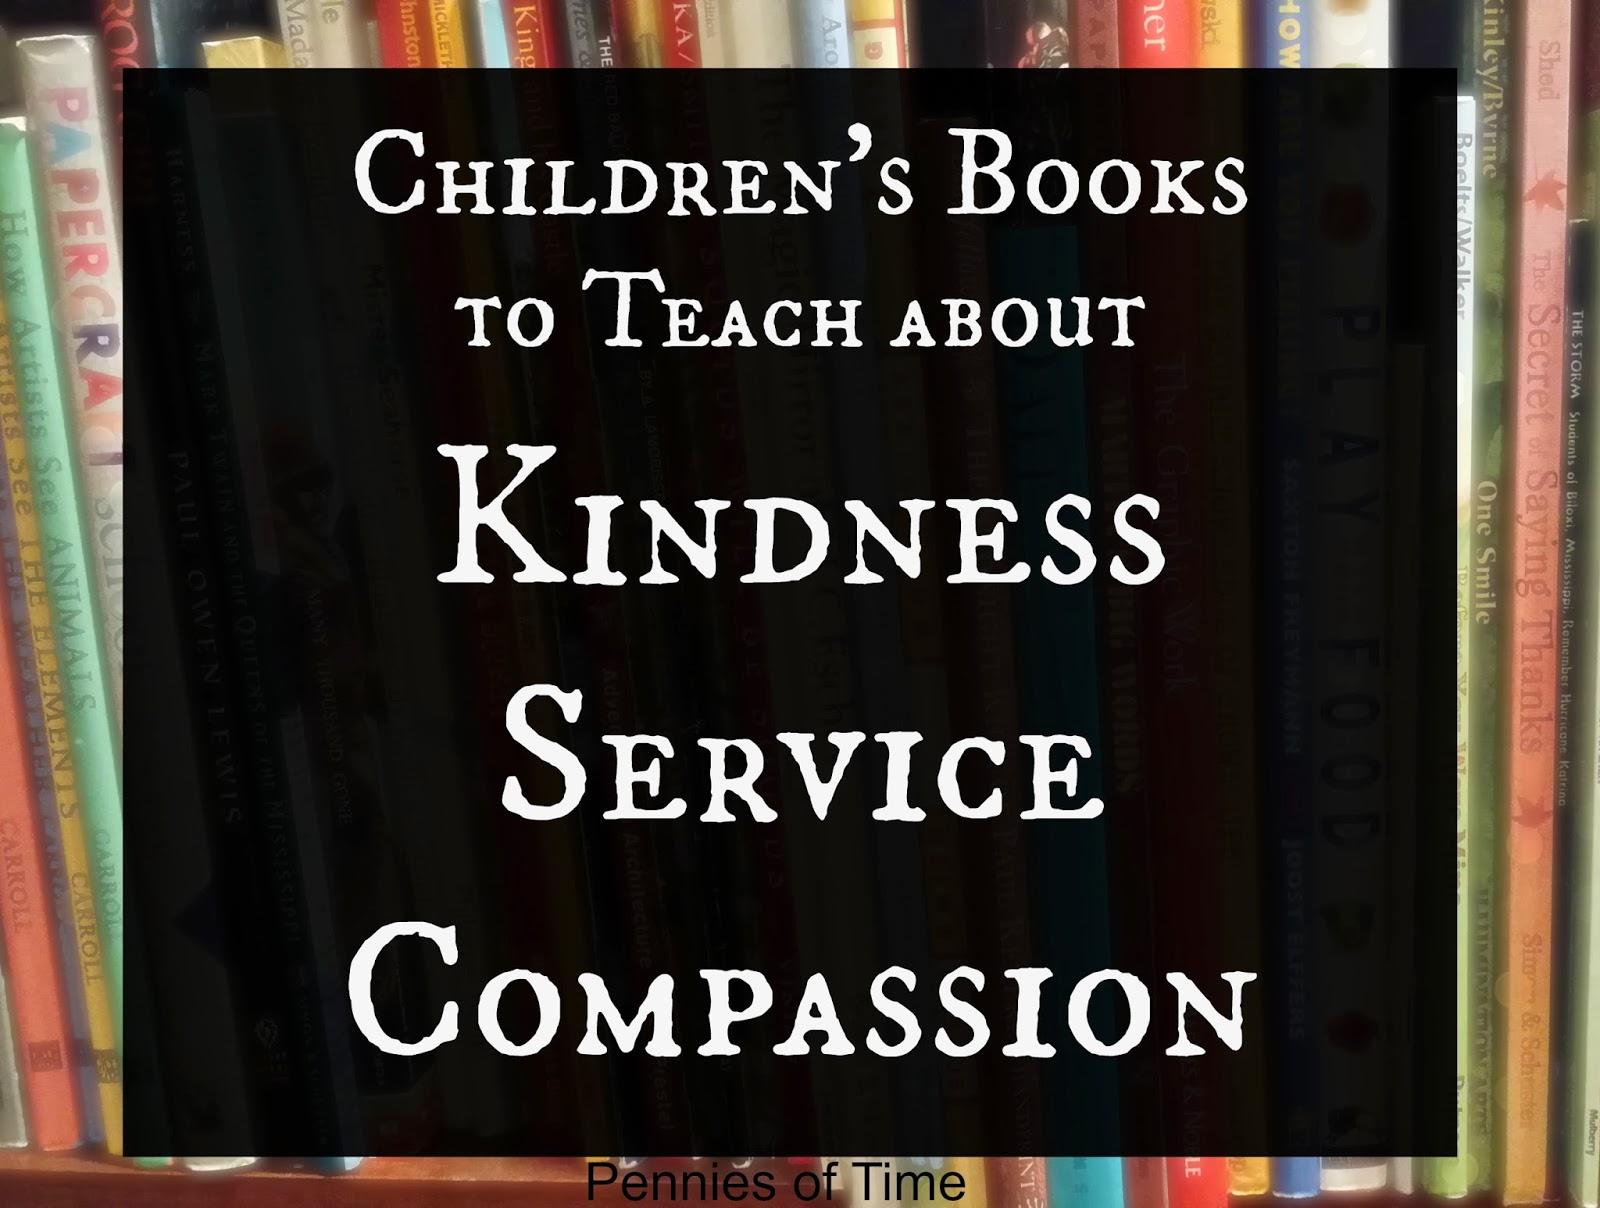 http://penniesoftime.blogspot.com/p/books-on-service-and-kindness.html